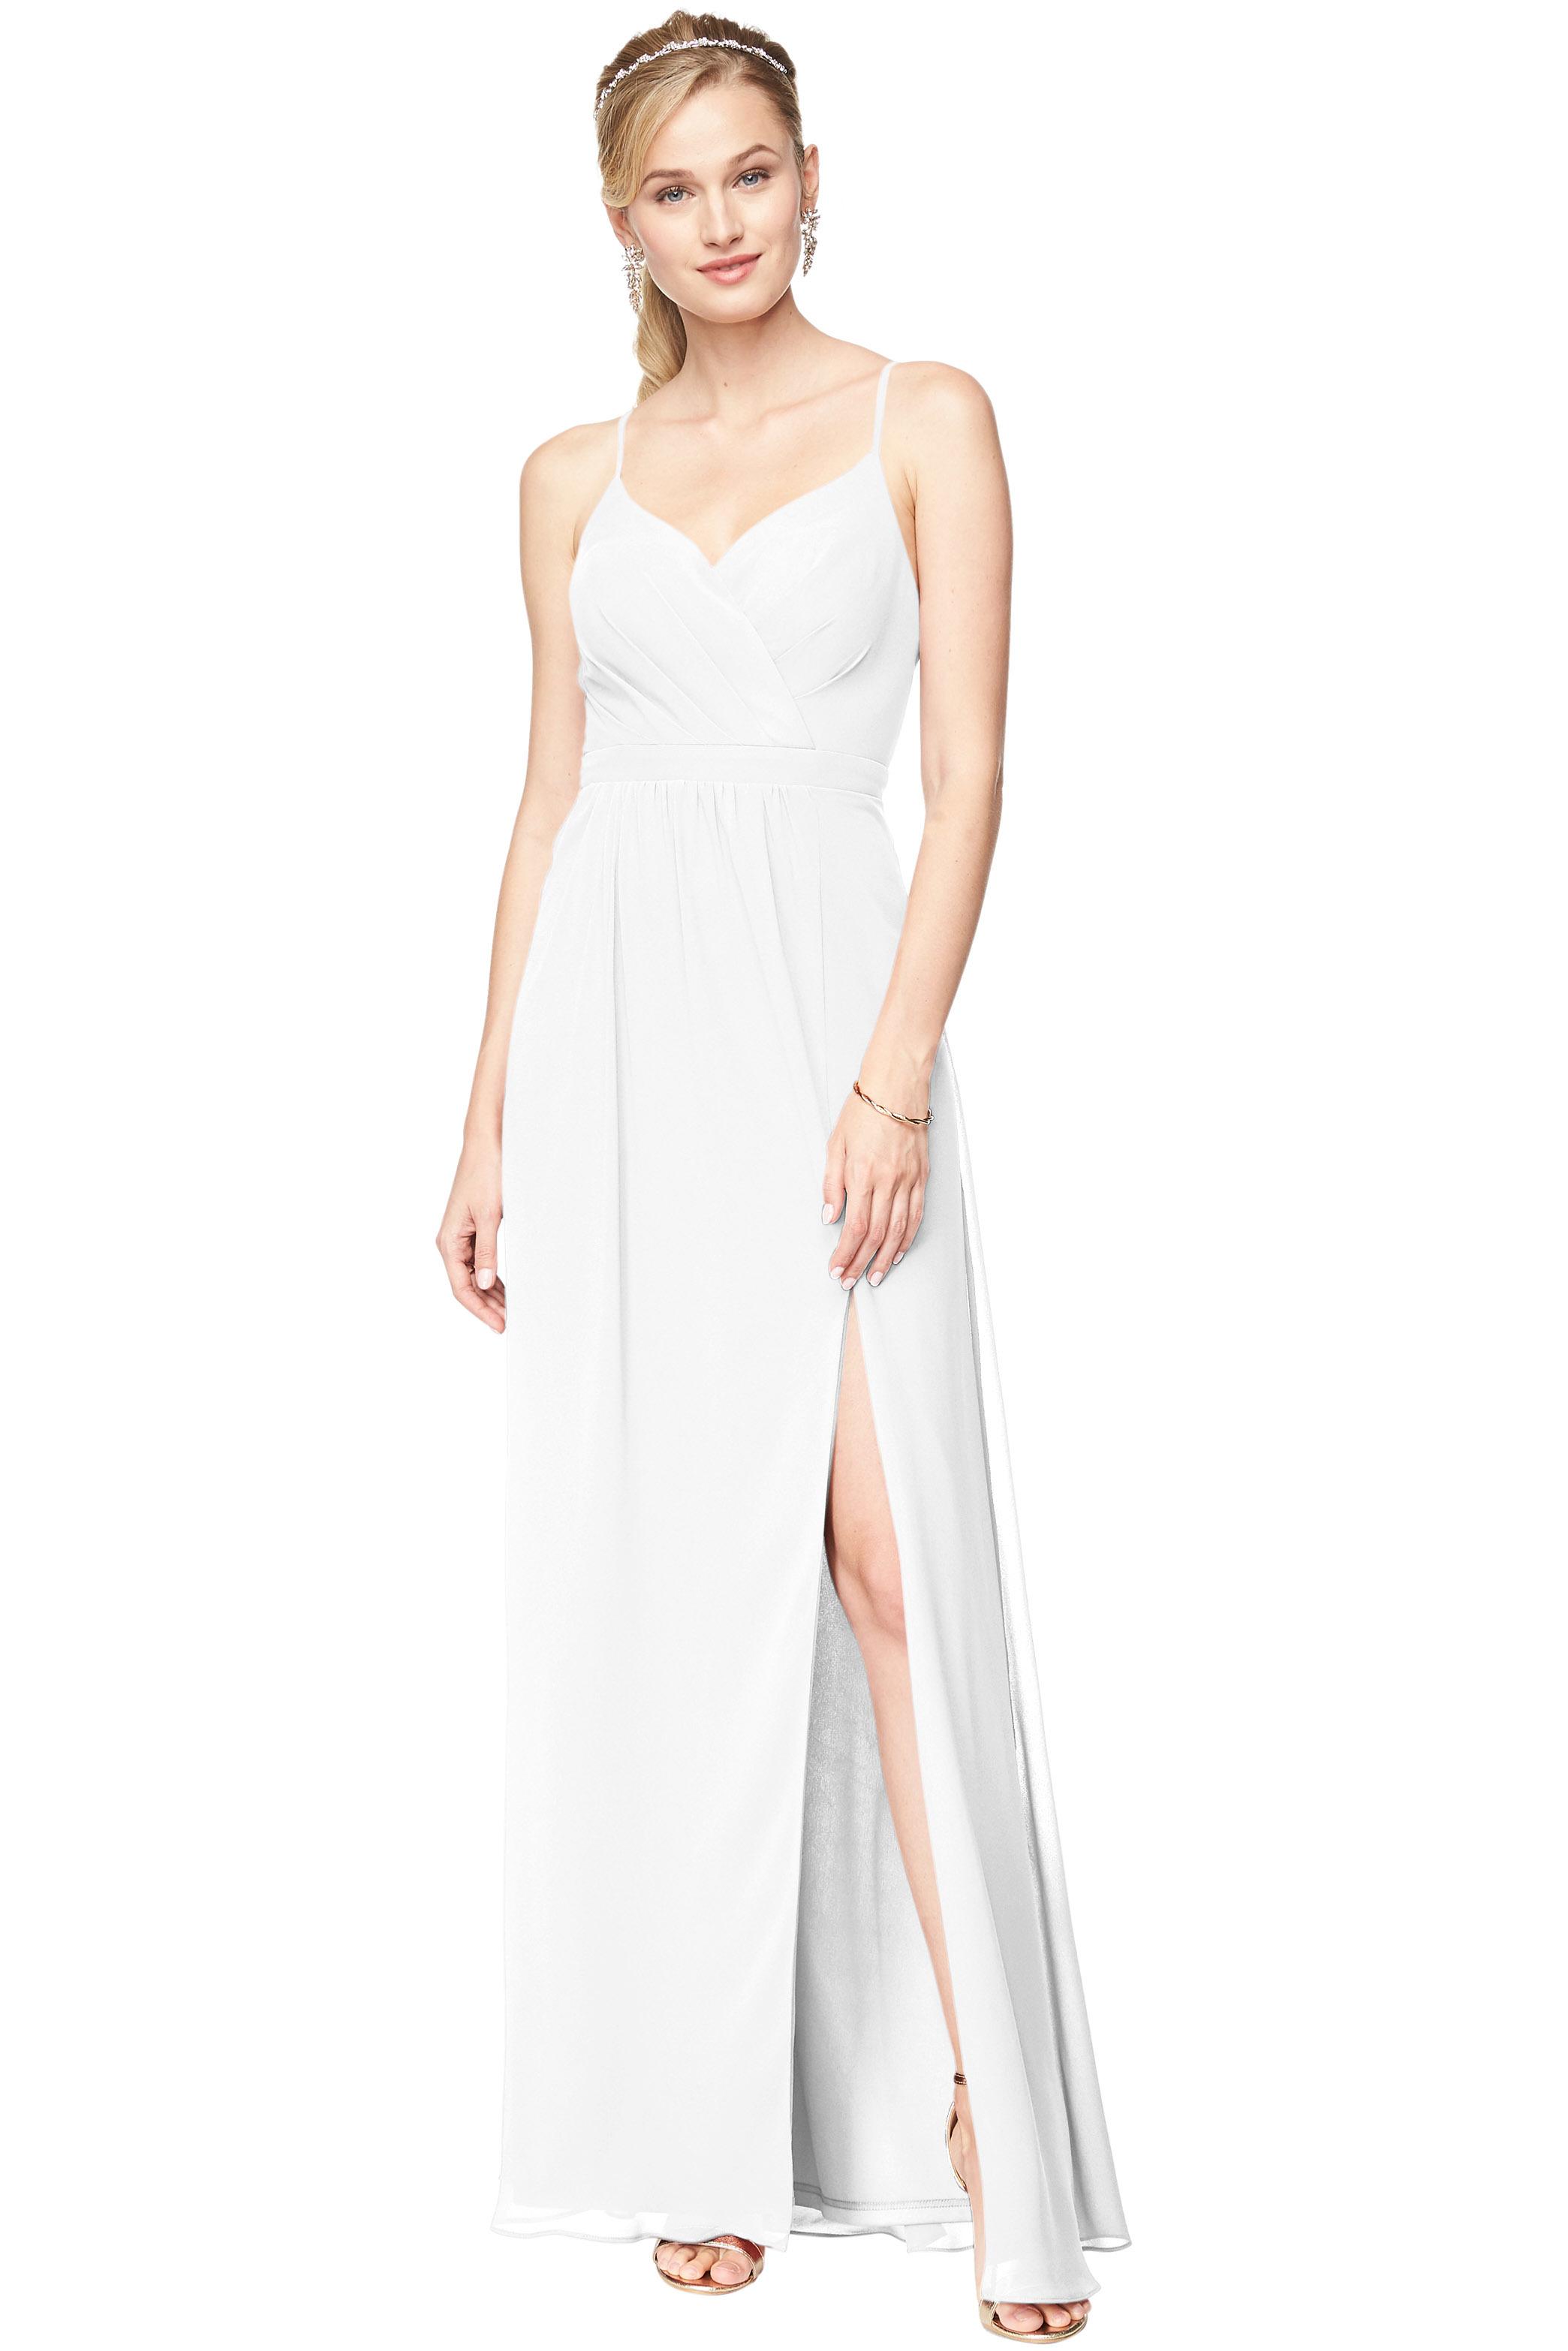 Bill Levkoff WHITE Chiffon Surplice A-Line gown, $178.00 Front